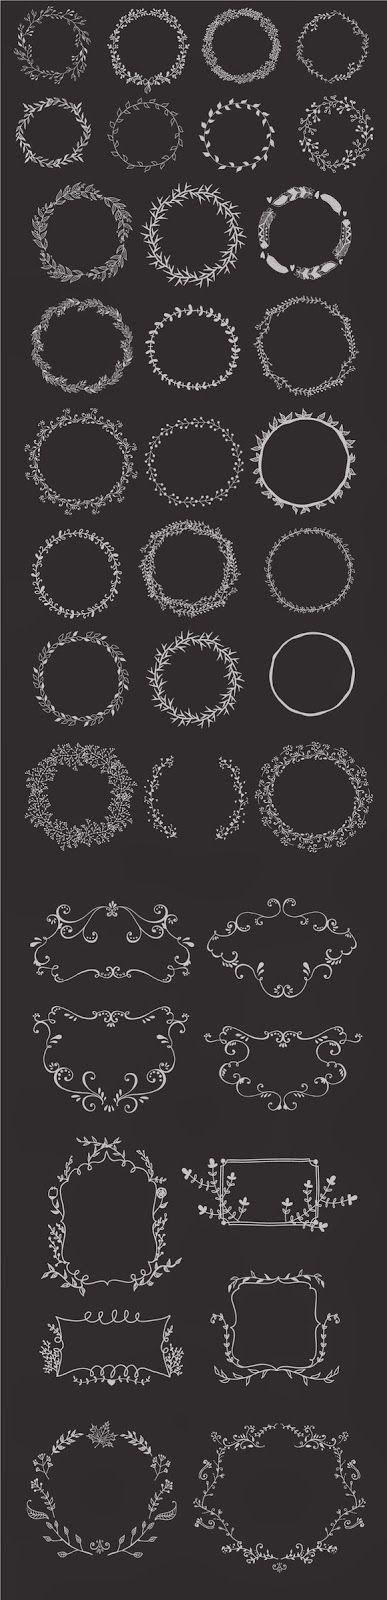 Hand drawn wreaths and frames | Freebies PSD | wnętrza | Pinterest ...